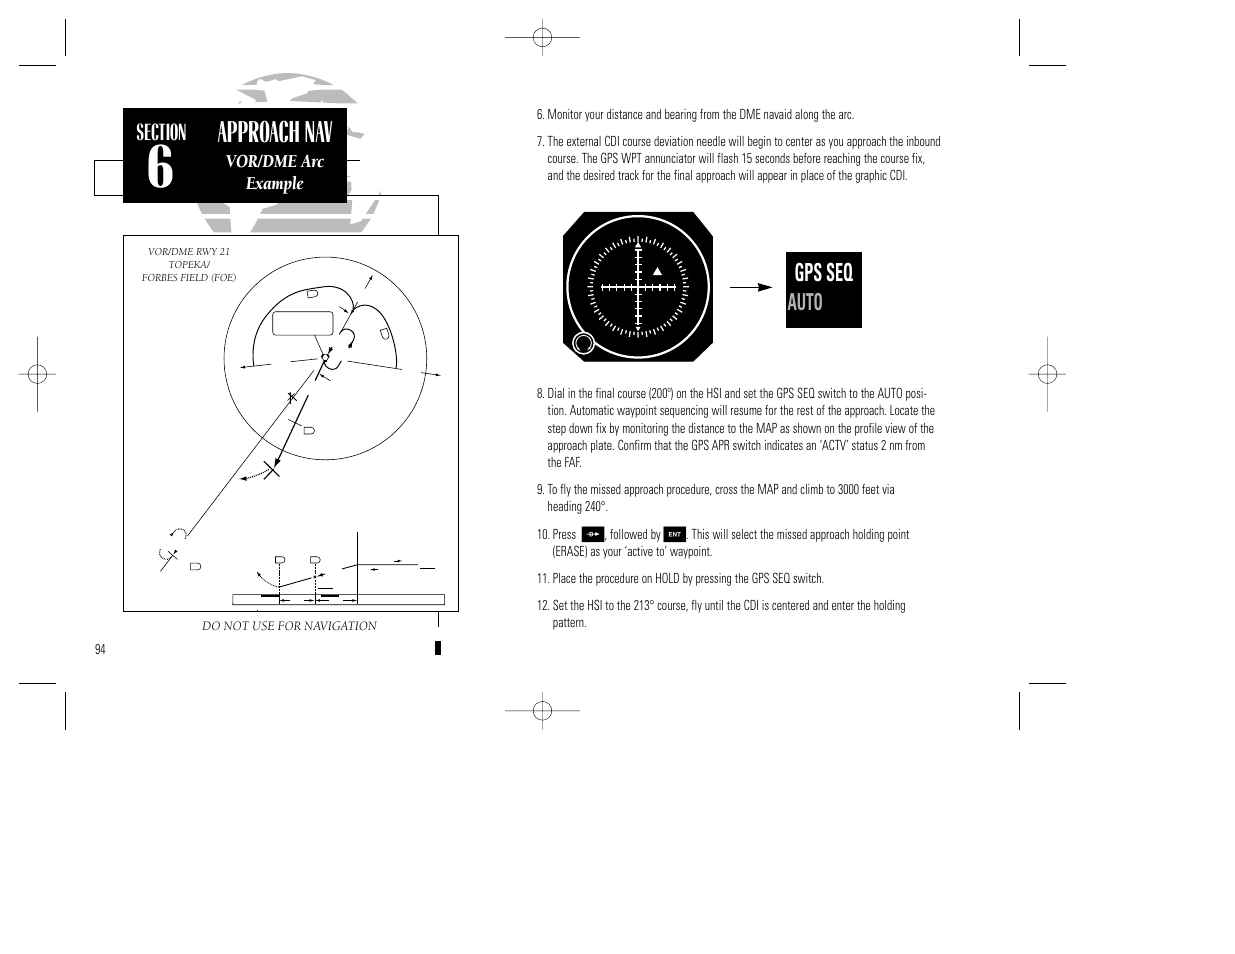 approach nav gps seq auto actv garmin gnc 300xl tso user manual rh manualsdir com GPS Garmin 250W GNC.com gnc 300xl user manual